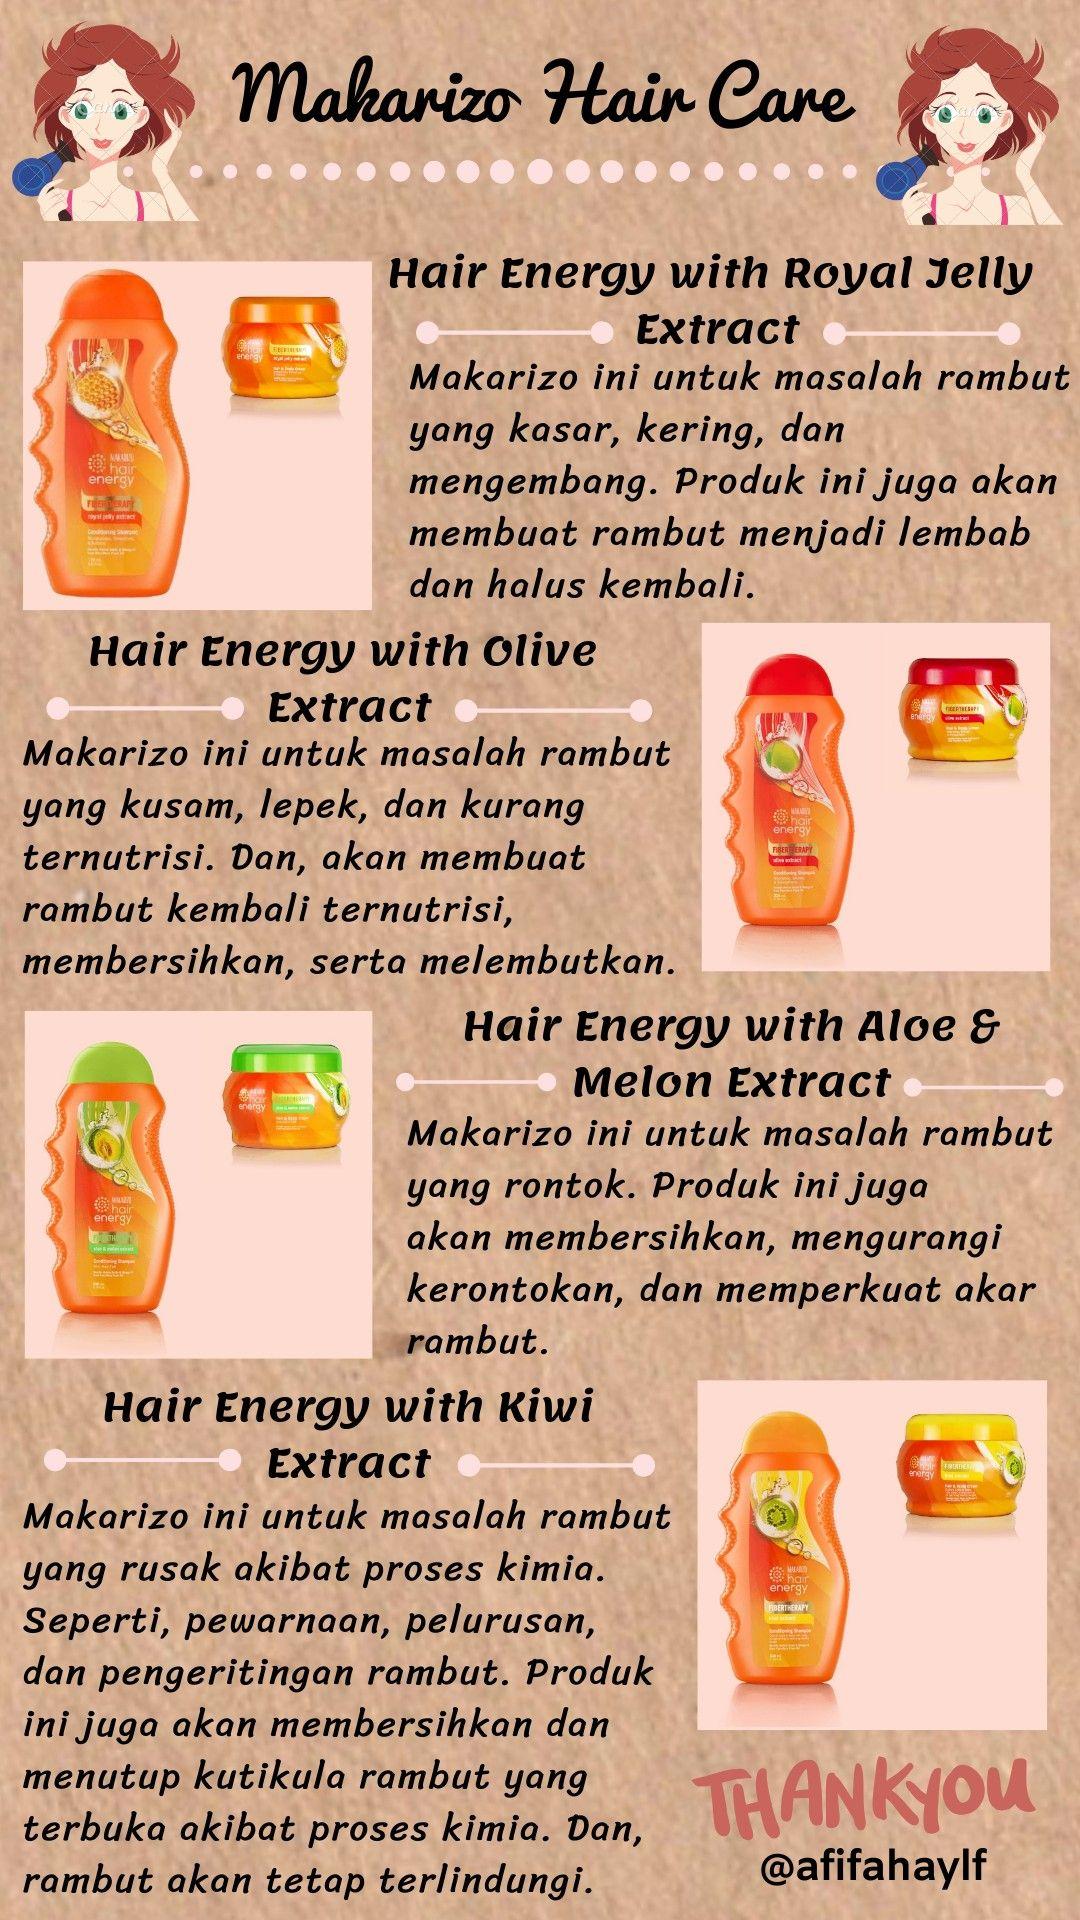 Hair Care Makarizo Hair Energy Di 2020 Merawat Rambut Kering Perawatan Rambut Alami Perawatan Rambut Rontok